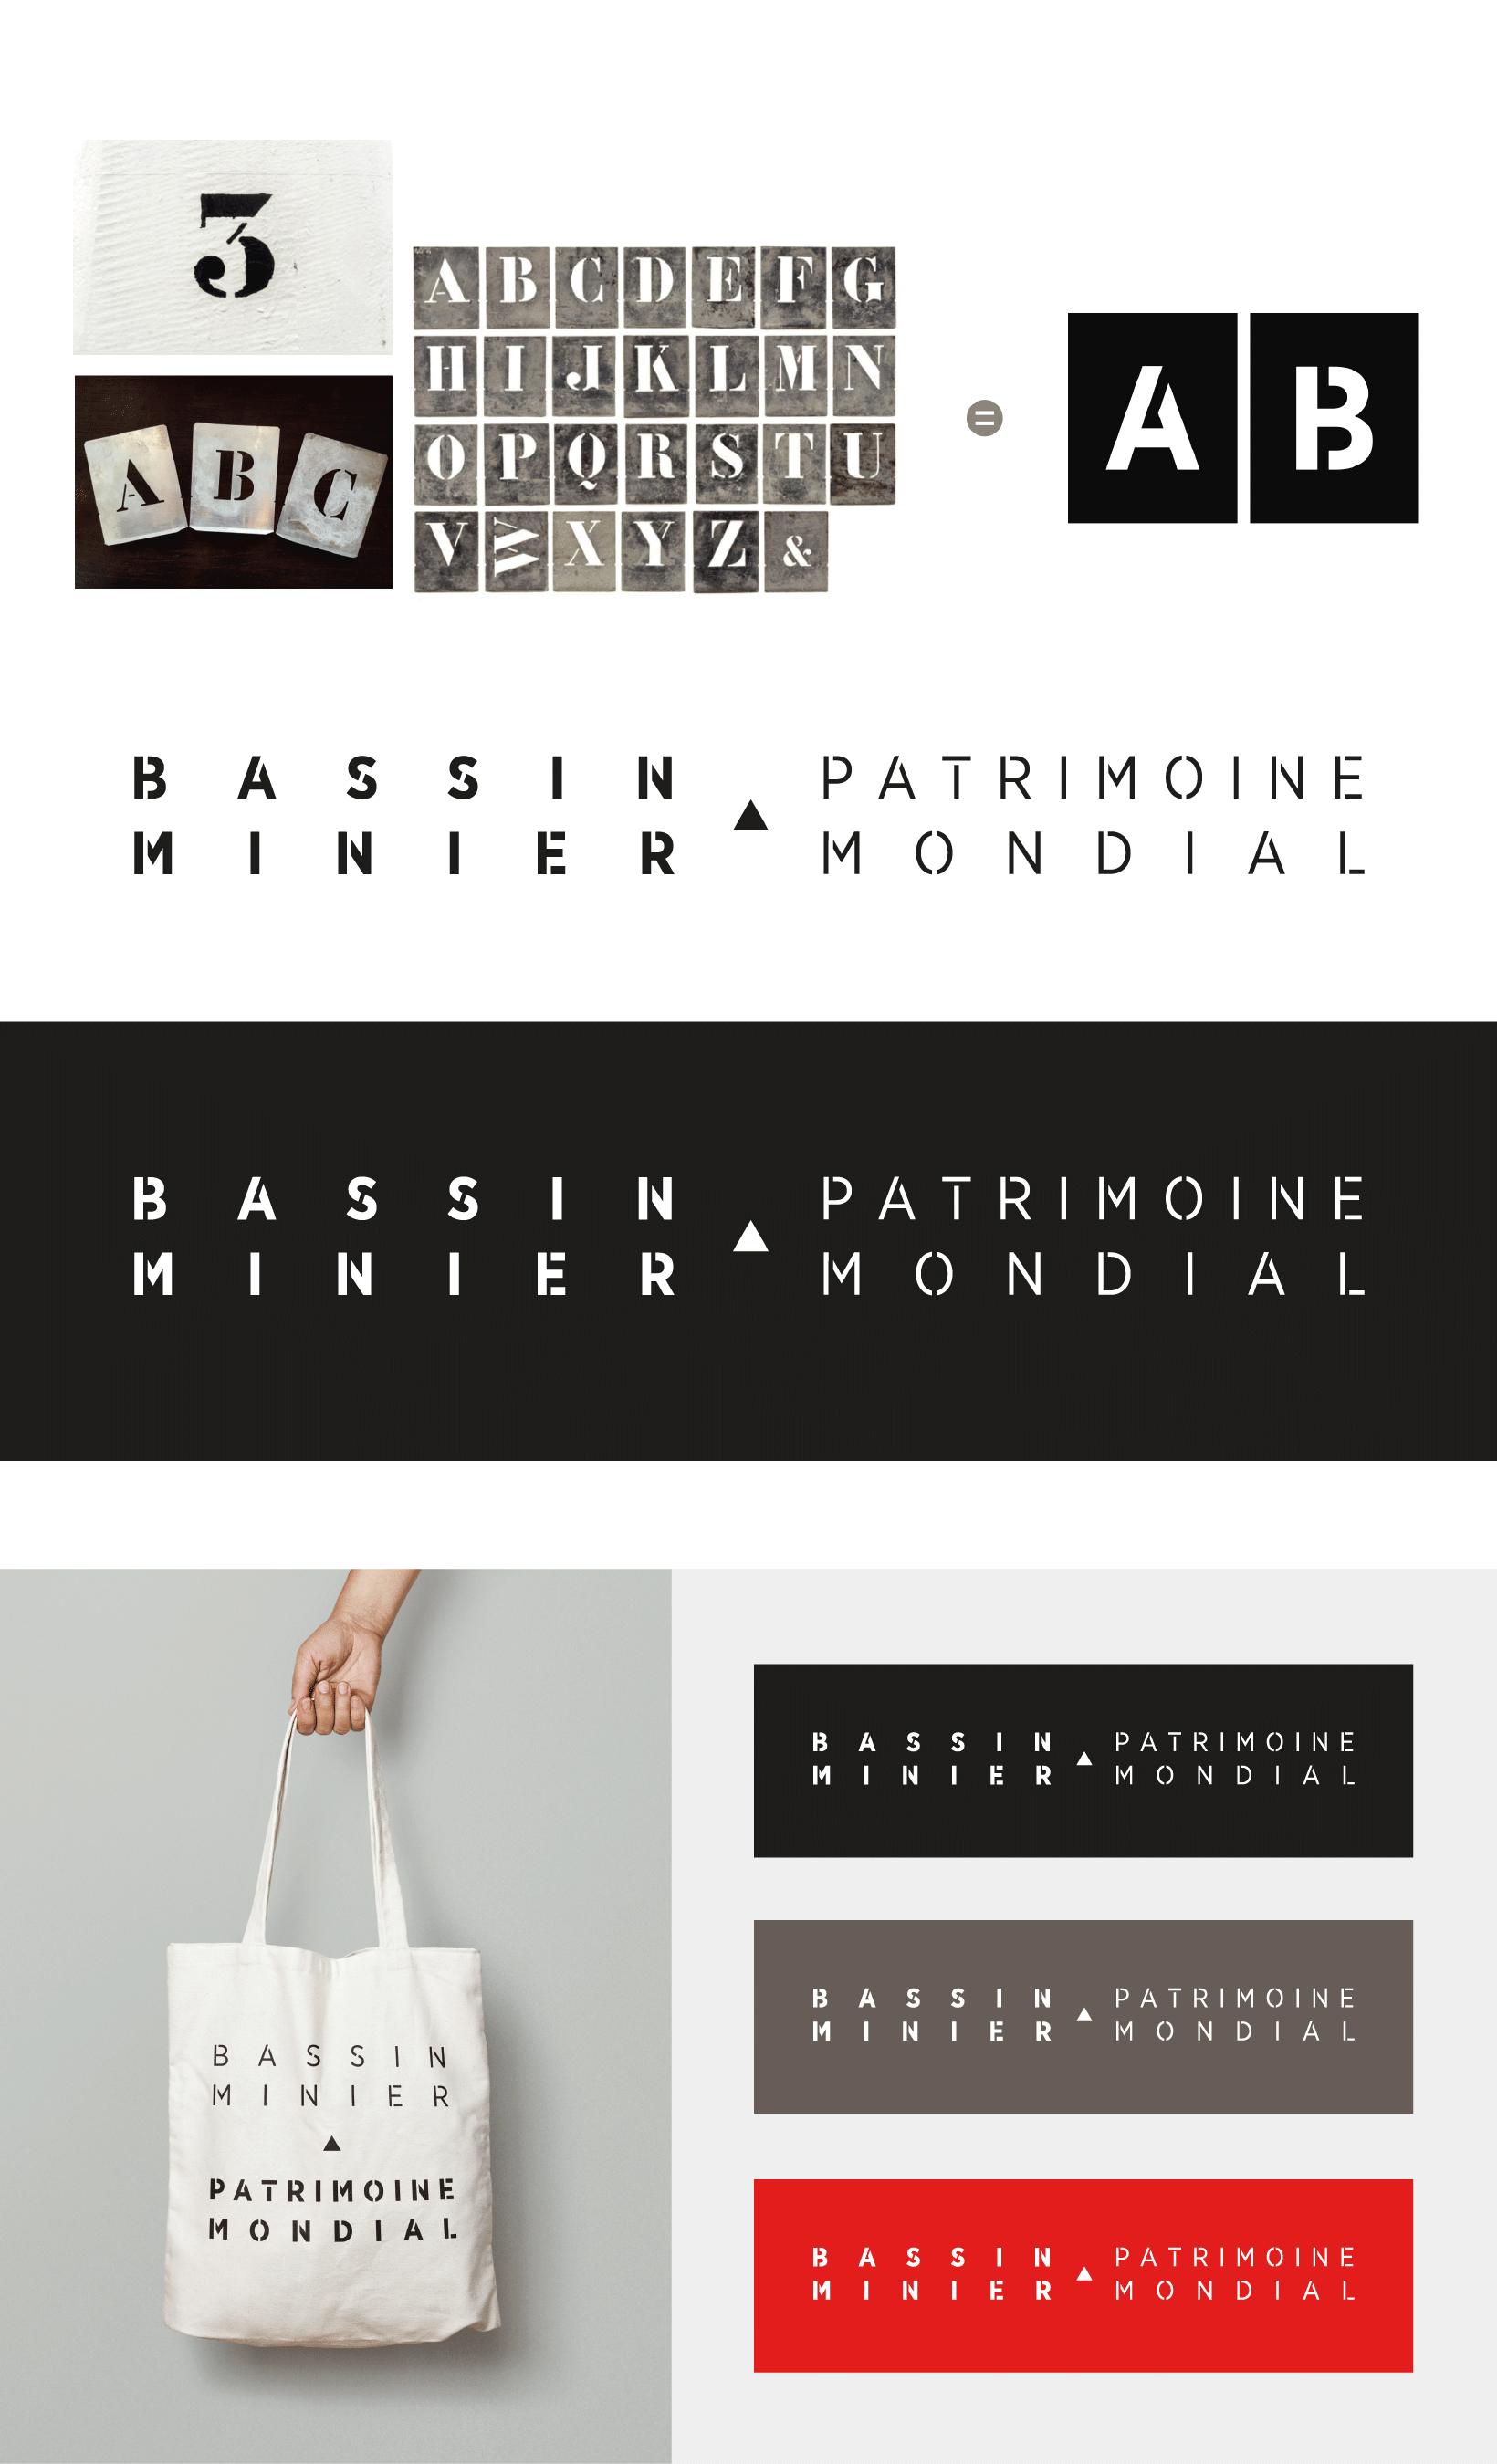 BassinMinierPatrimoineMondial-03